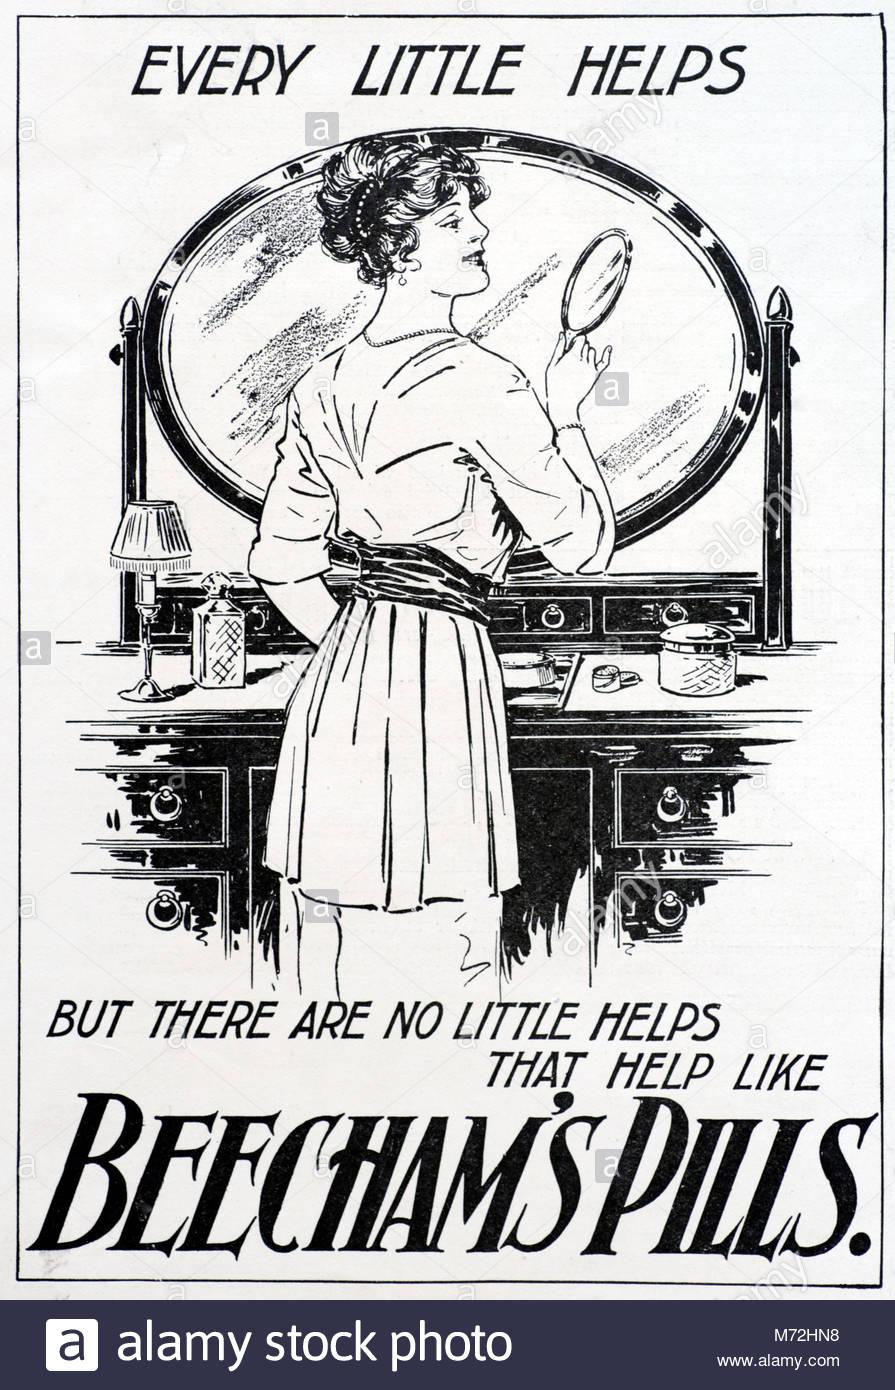 Beecham's Pills vintage advertising 1915 - Stock Image